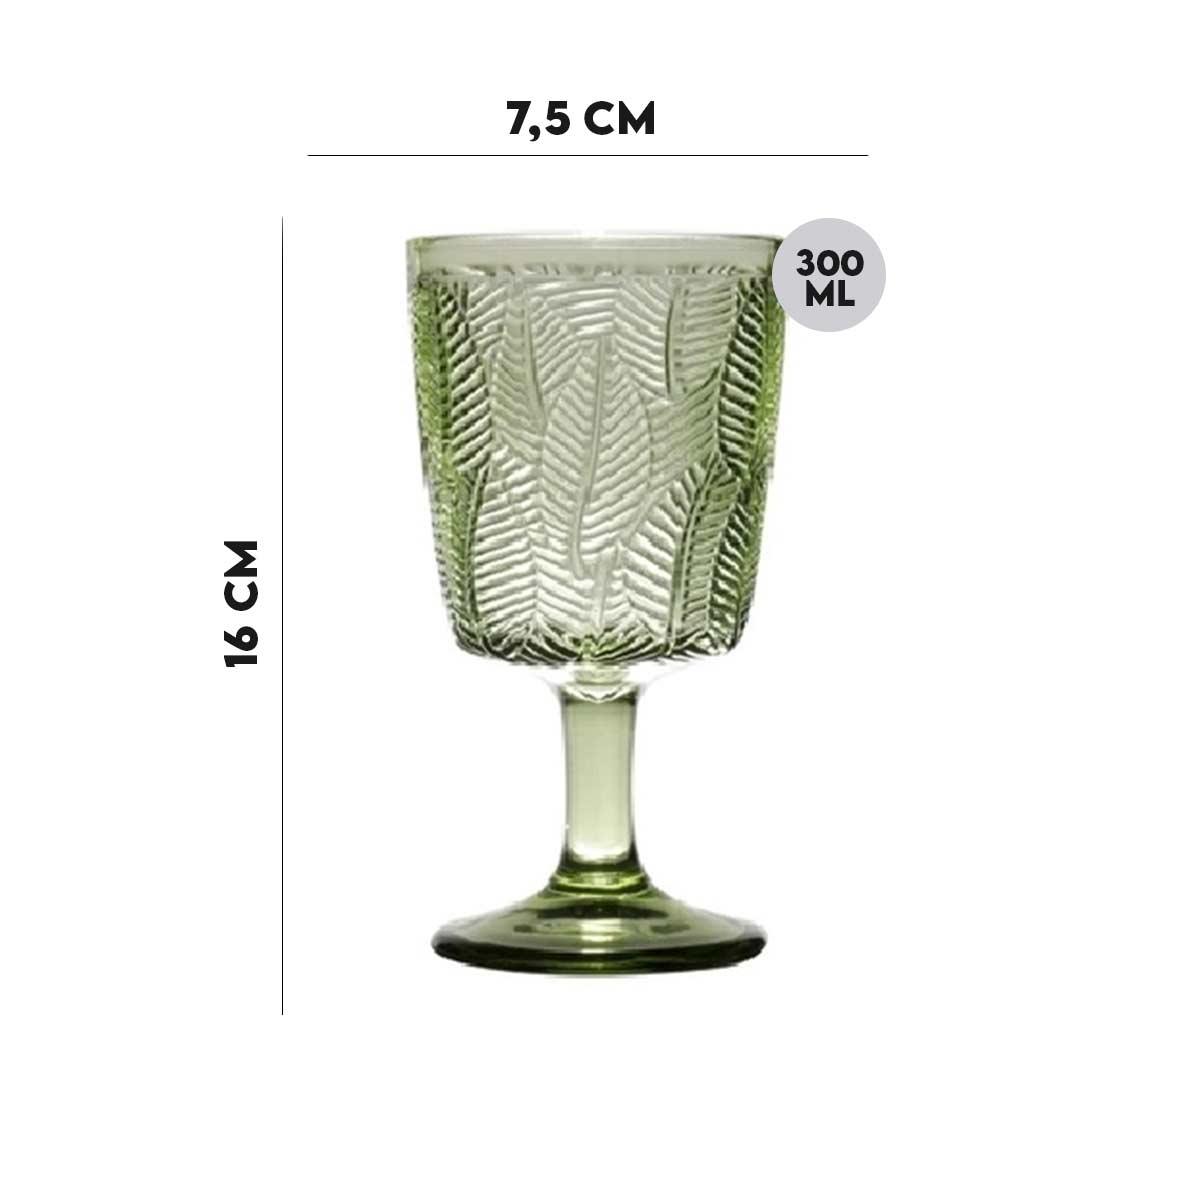 Taça p/ água Vidro Sodo-Cálcico Leaves Verde 300 ml  - Lemis